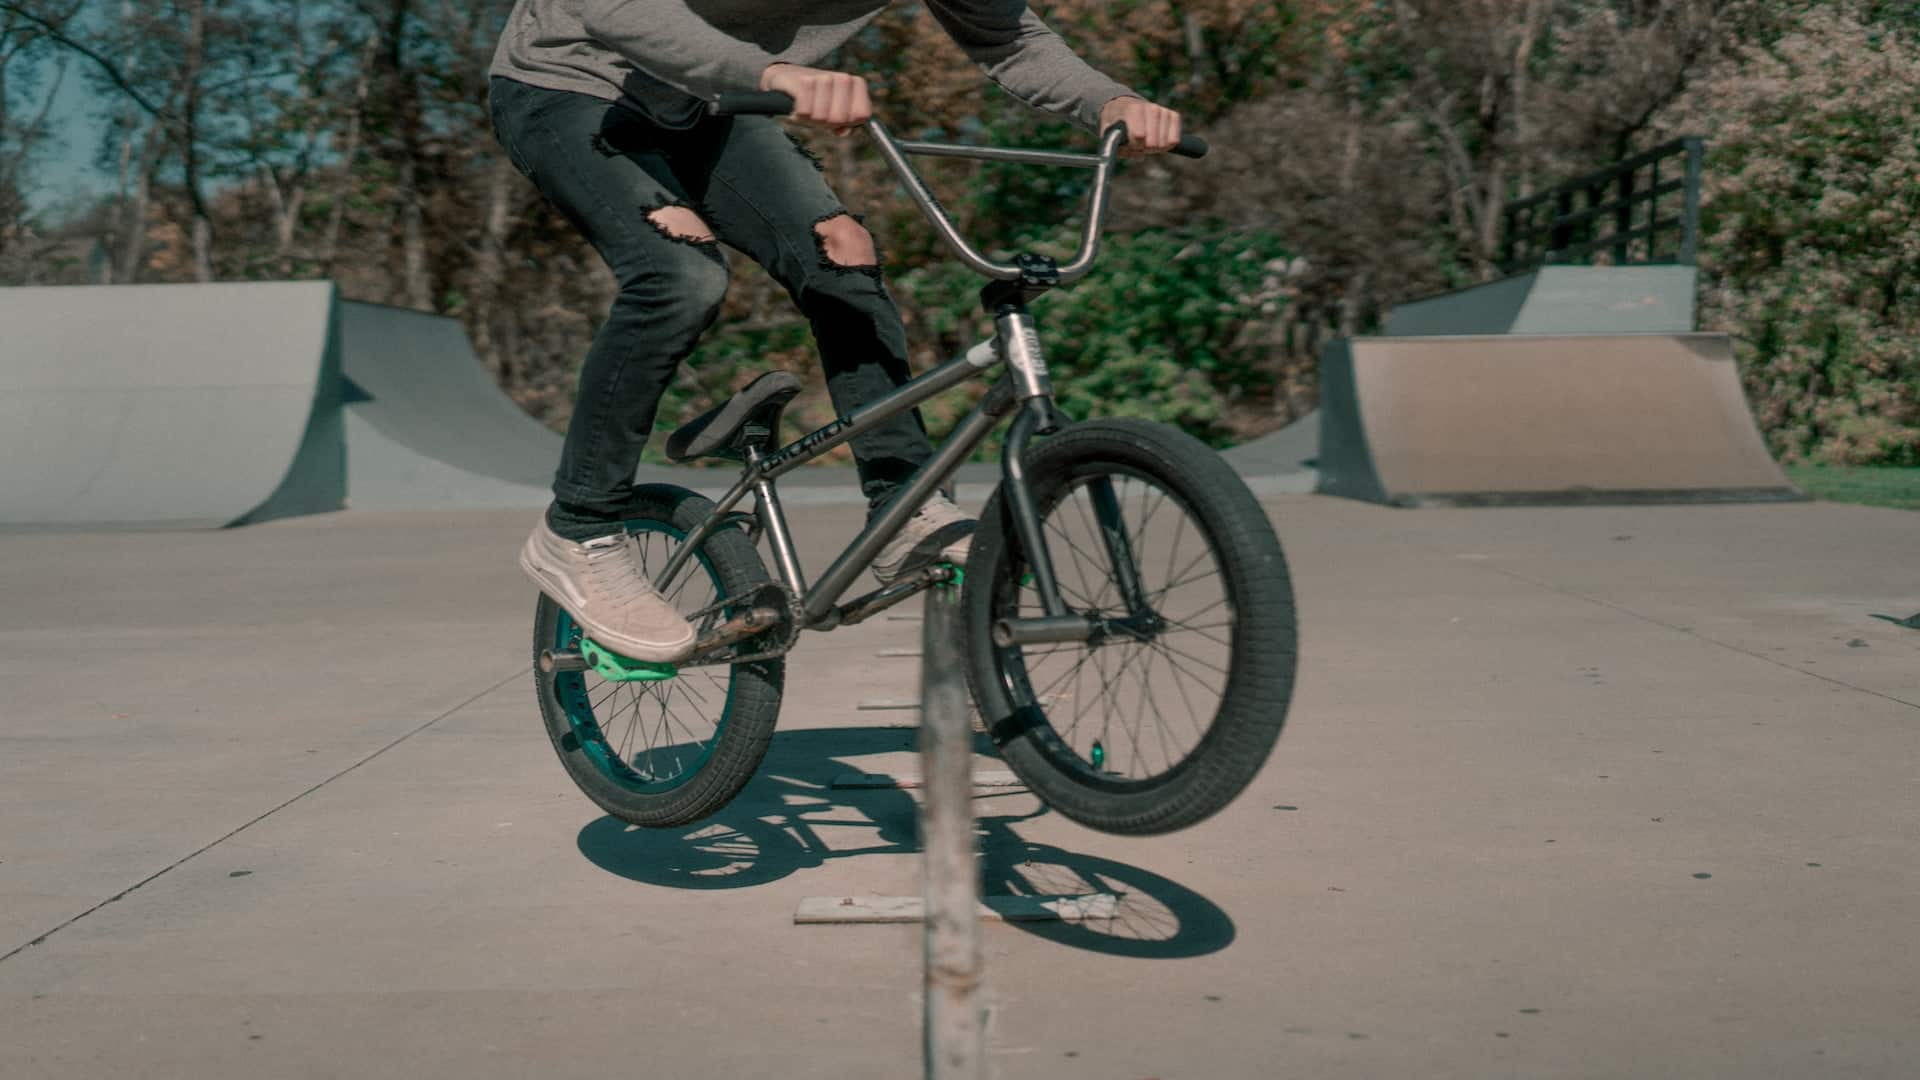 Bicicletas BMX: ¿Cuál es la mejor del 2020?